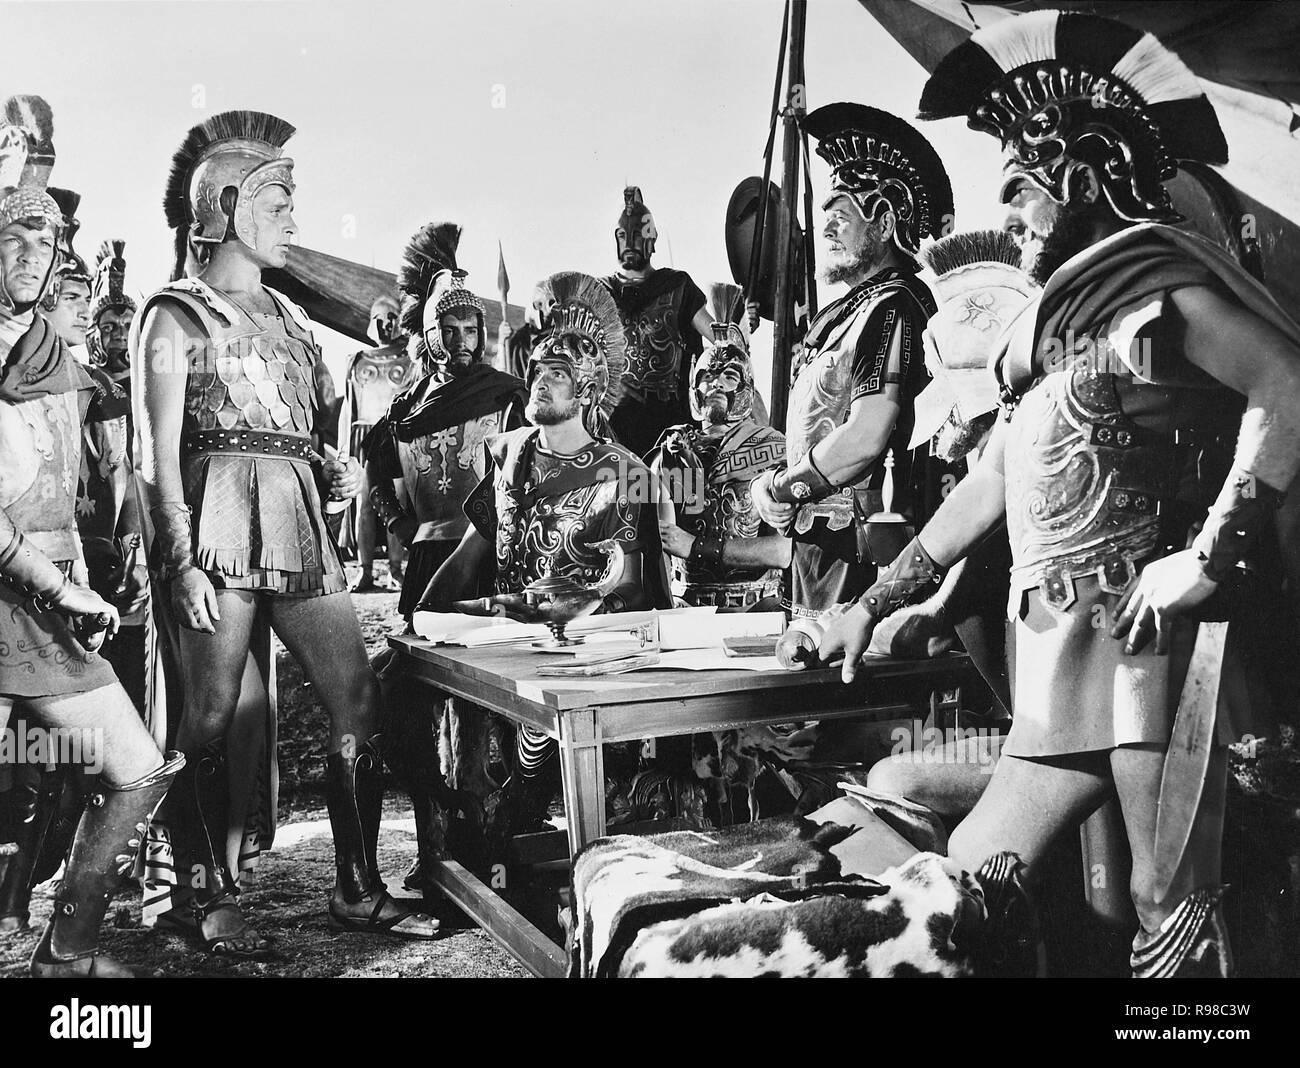 Original film title: ALEXANDER THE GREAT. English title: ALEXANDER THE GREAT. Year: 1956. Director: ROBERT ROSSEN. Stars: ALEXANDER DER GROSSE; RICHARD BURTON. Credit: UNITED ARTISTS / Album - Stock Image